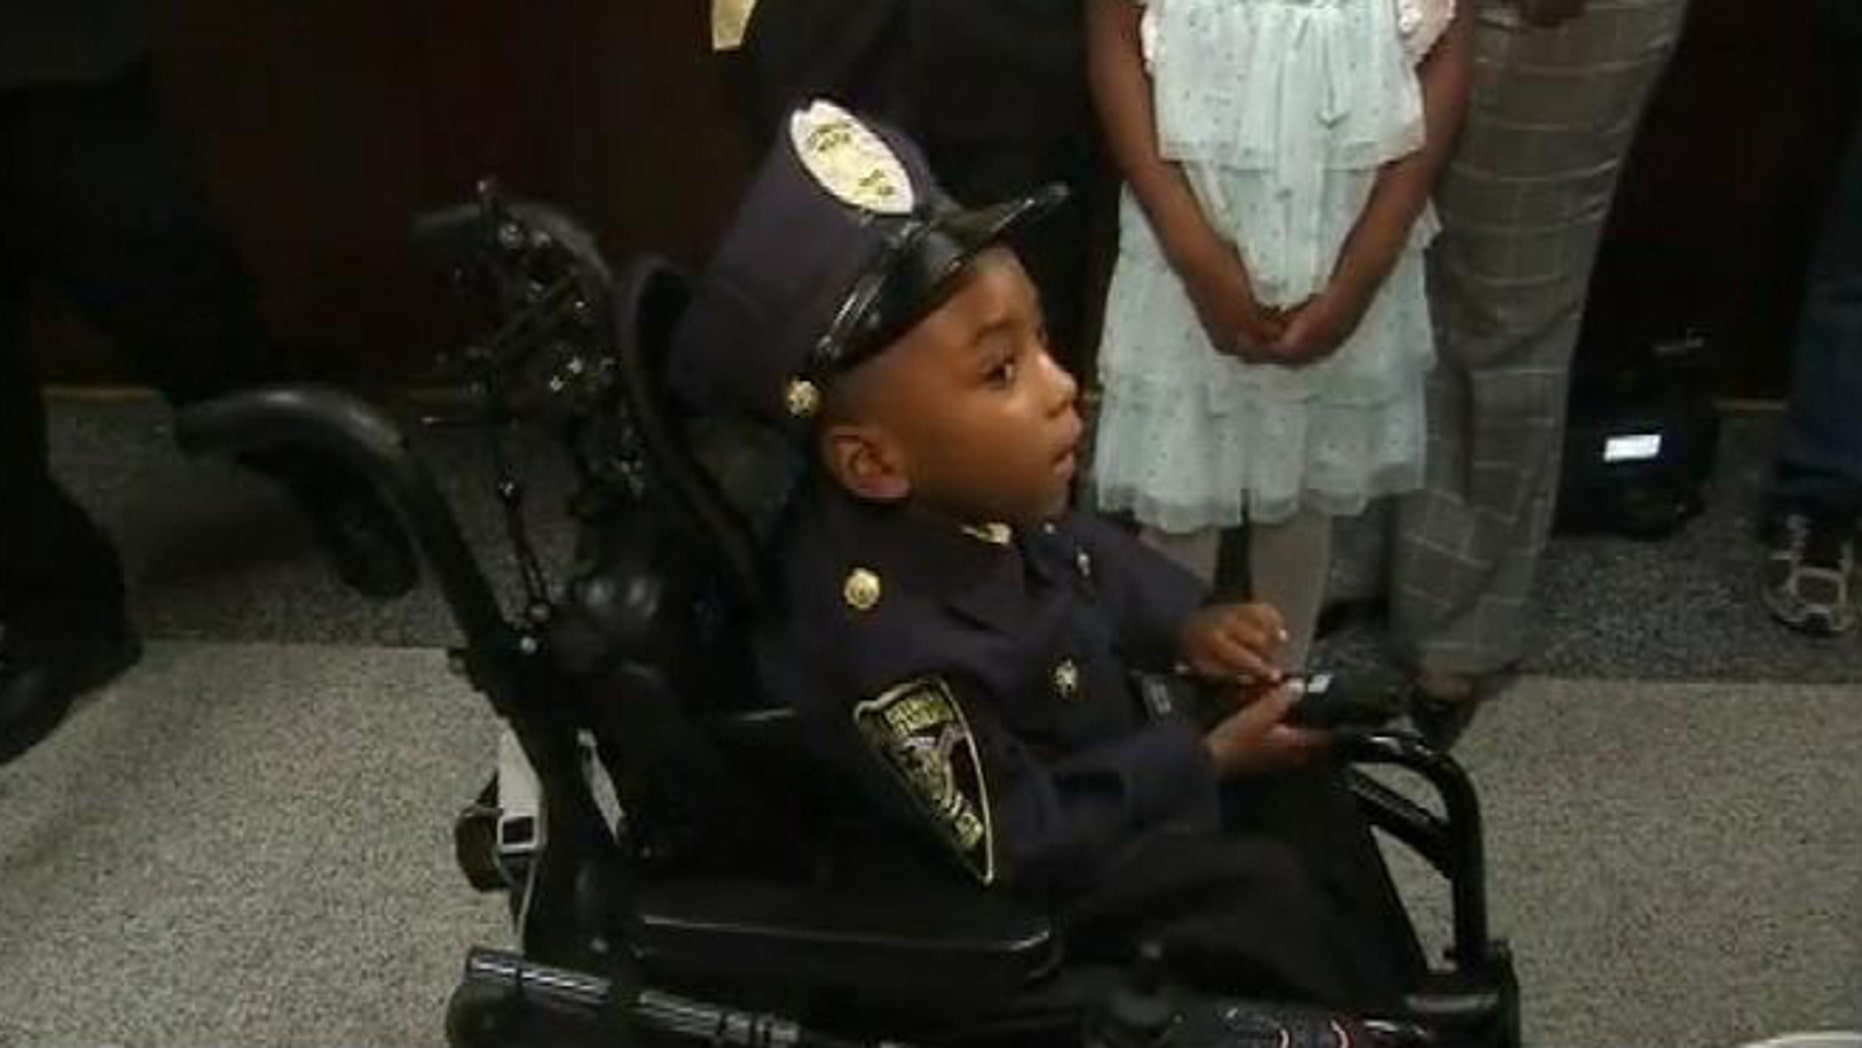 Dec. 2, 2013: Morgan Steward, 5, is sworn in as a honorary police officer in Covington, Ga.